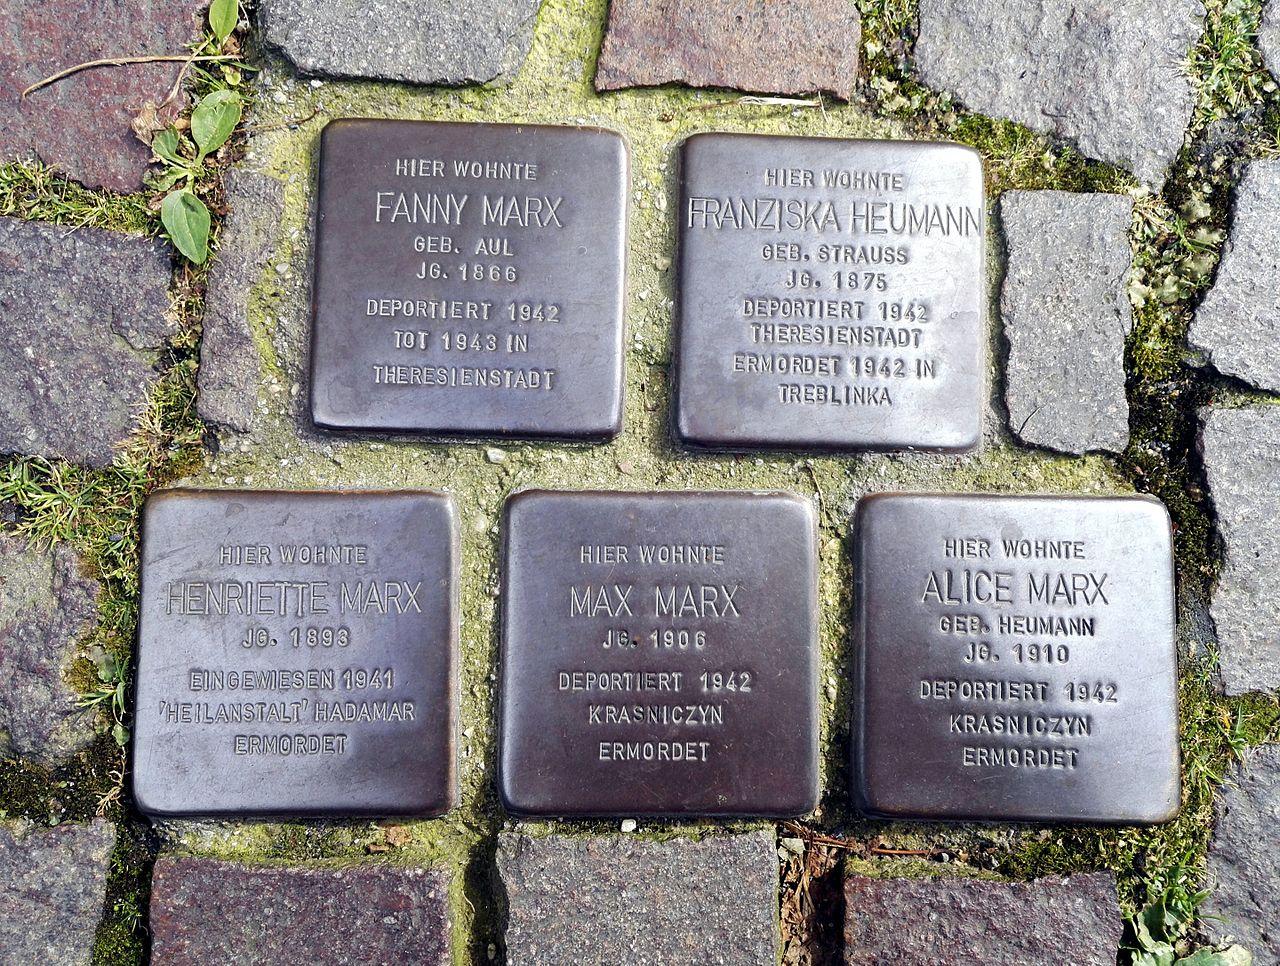 Stolpersteins Fanny Marx, Franziska Heumann, Henriette Marx, Max Marx, Alice Marx, Marktstraße 59, Remagen